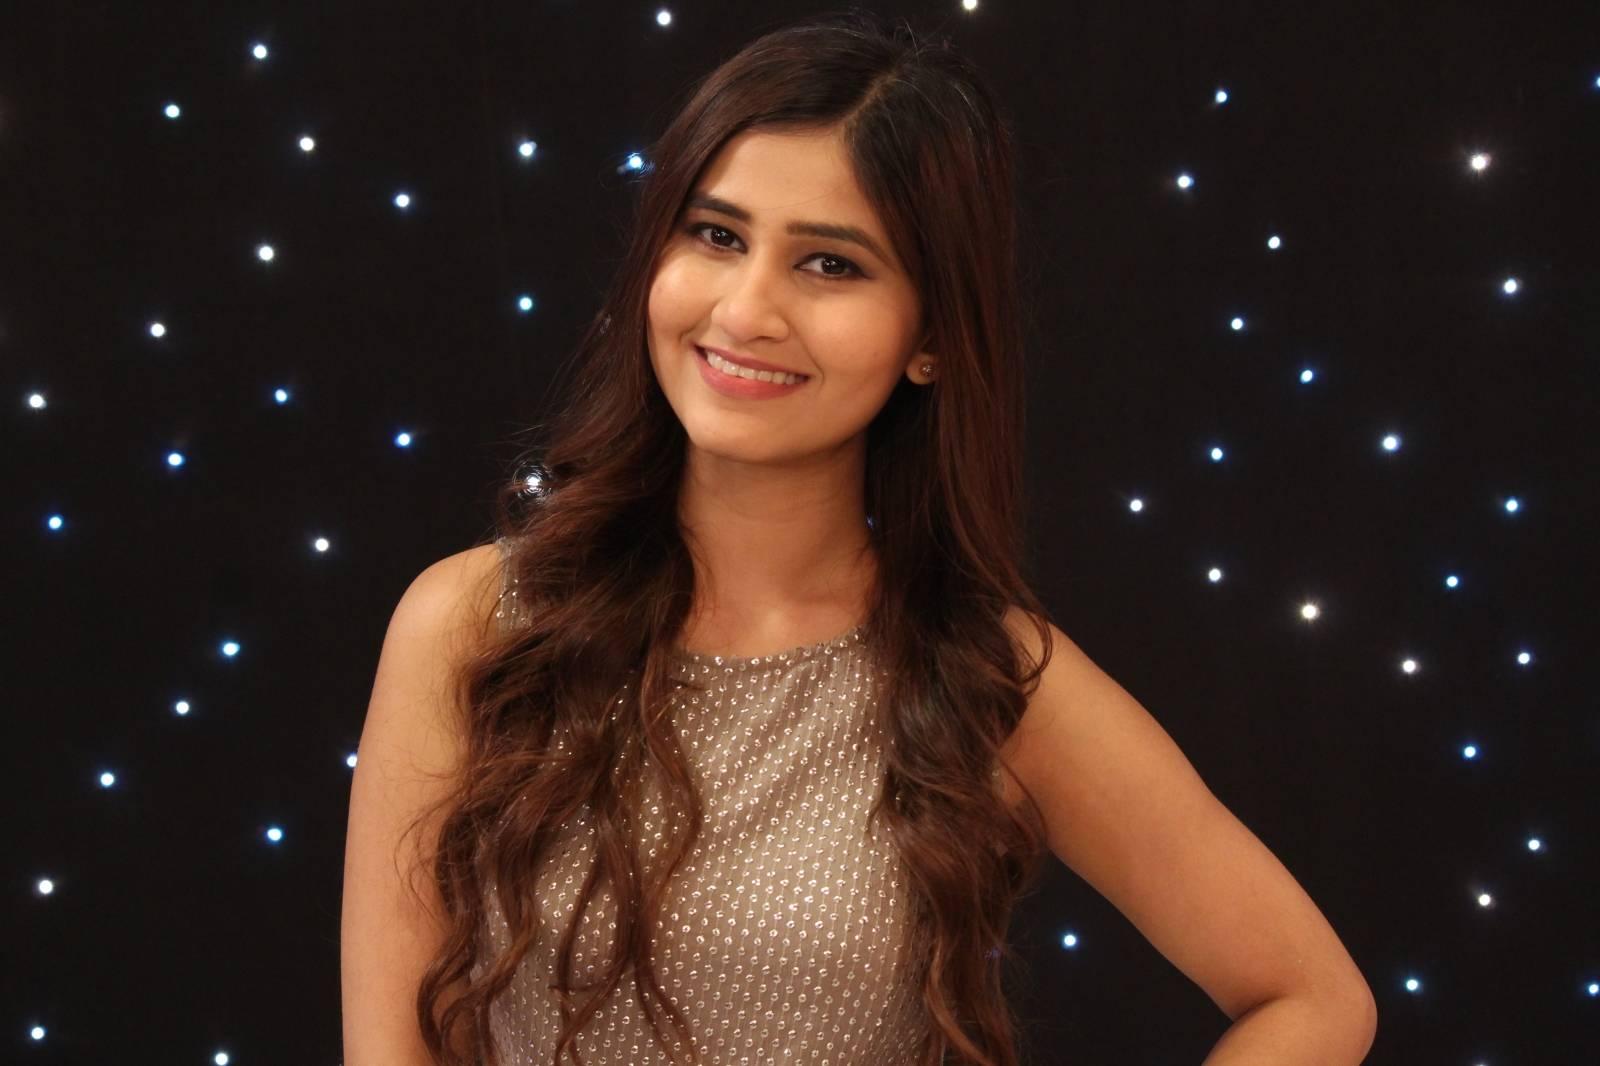 Chandni Sandhu